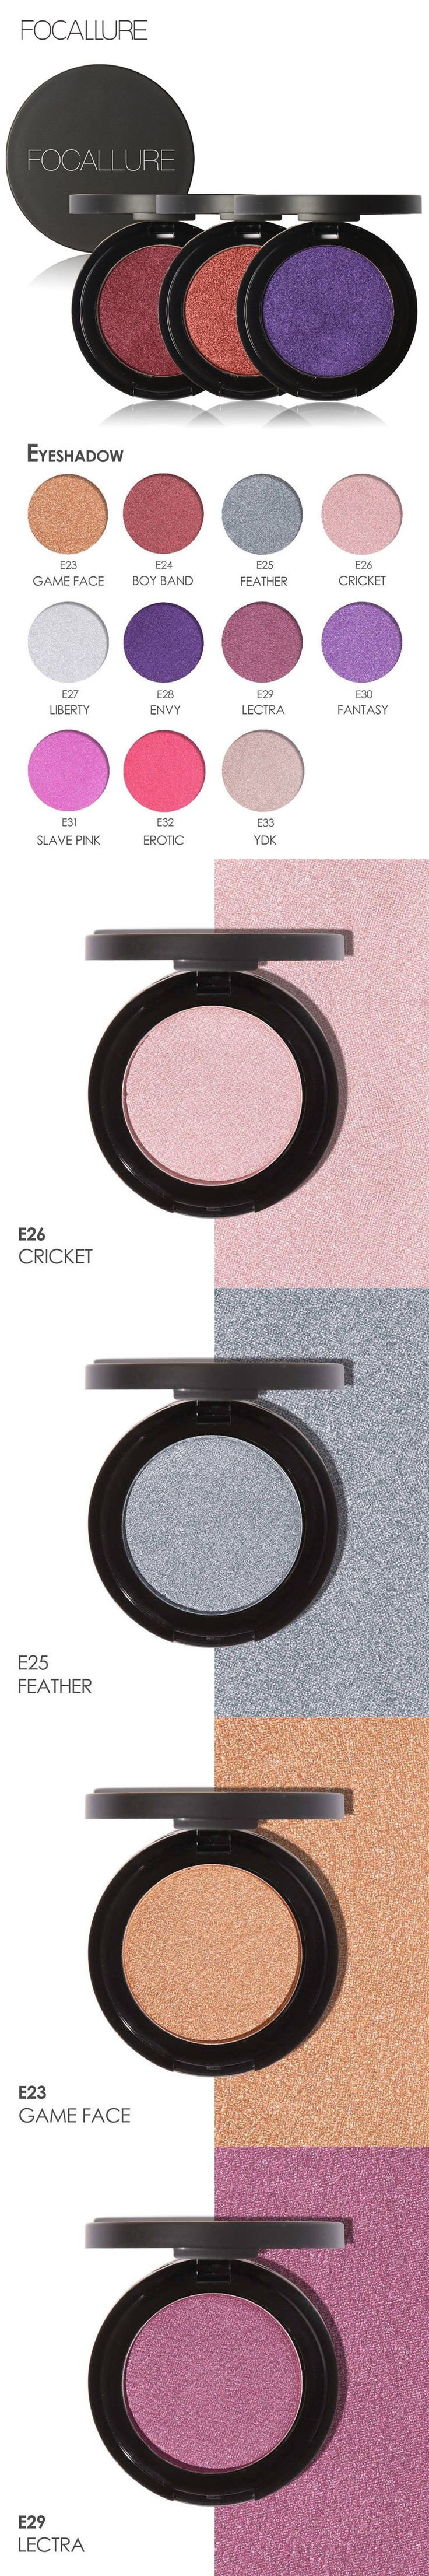 FOCALLURE Shimmer Eyeshadow Palette Cosmetic 11 Color Single Eye Shadow Makeup Party Waterproof Makeup Eye Shadow Maquiagem